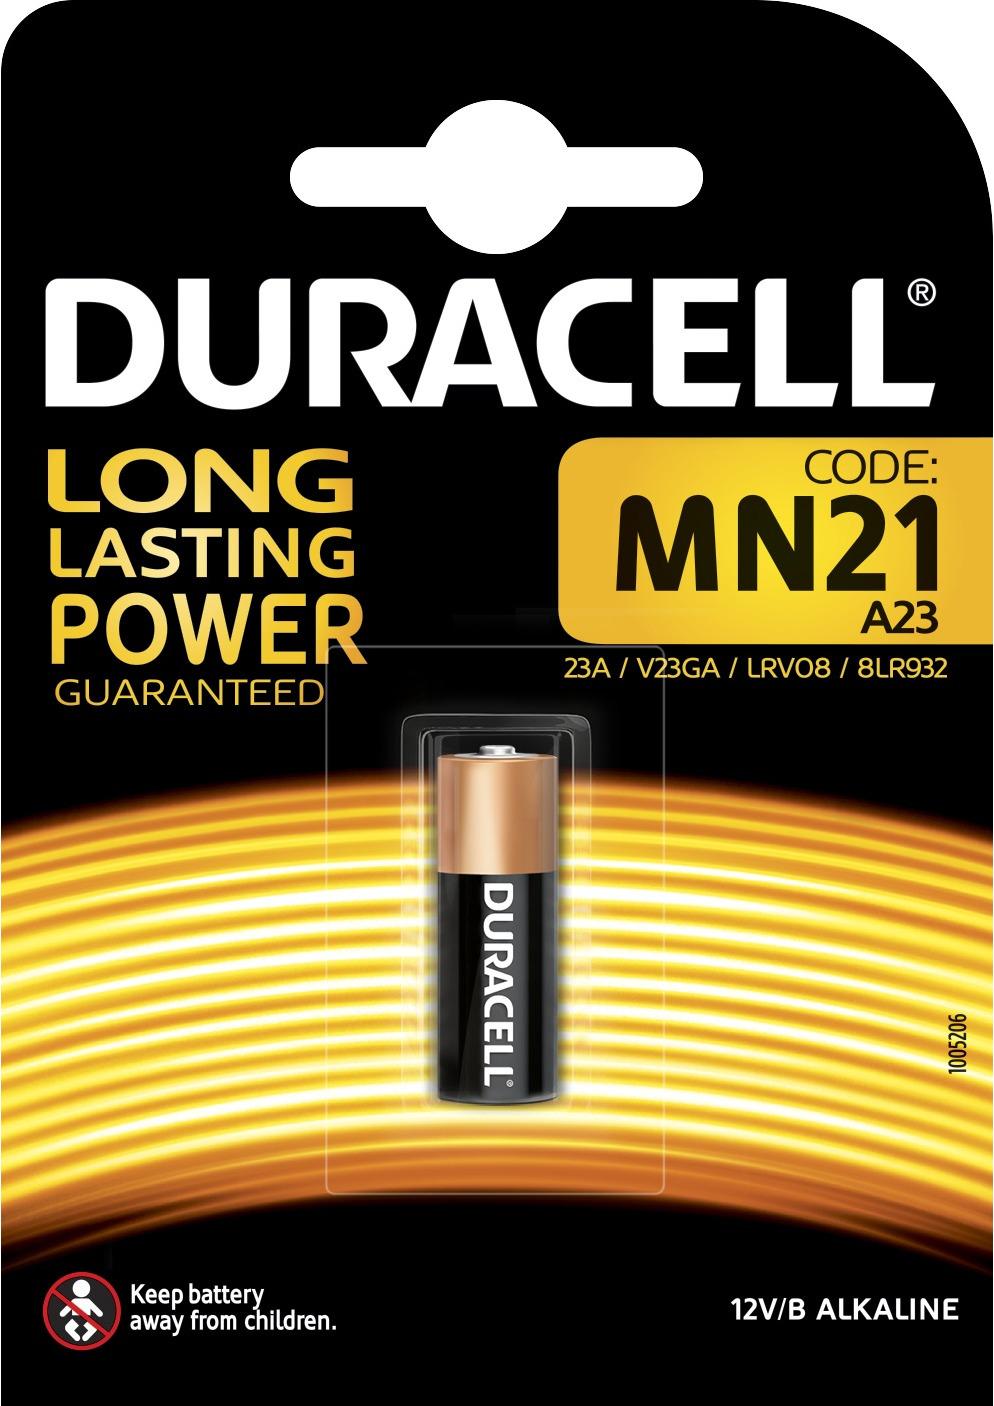 Батарейка алкалиновая для сигнализаций Duracell, тип MN21, 1 шт батарейка duracell mn21 a23 1 шт